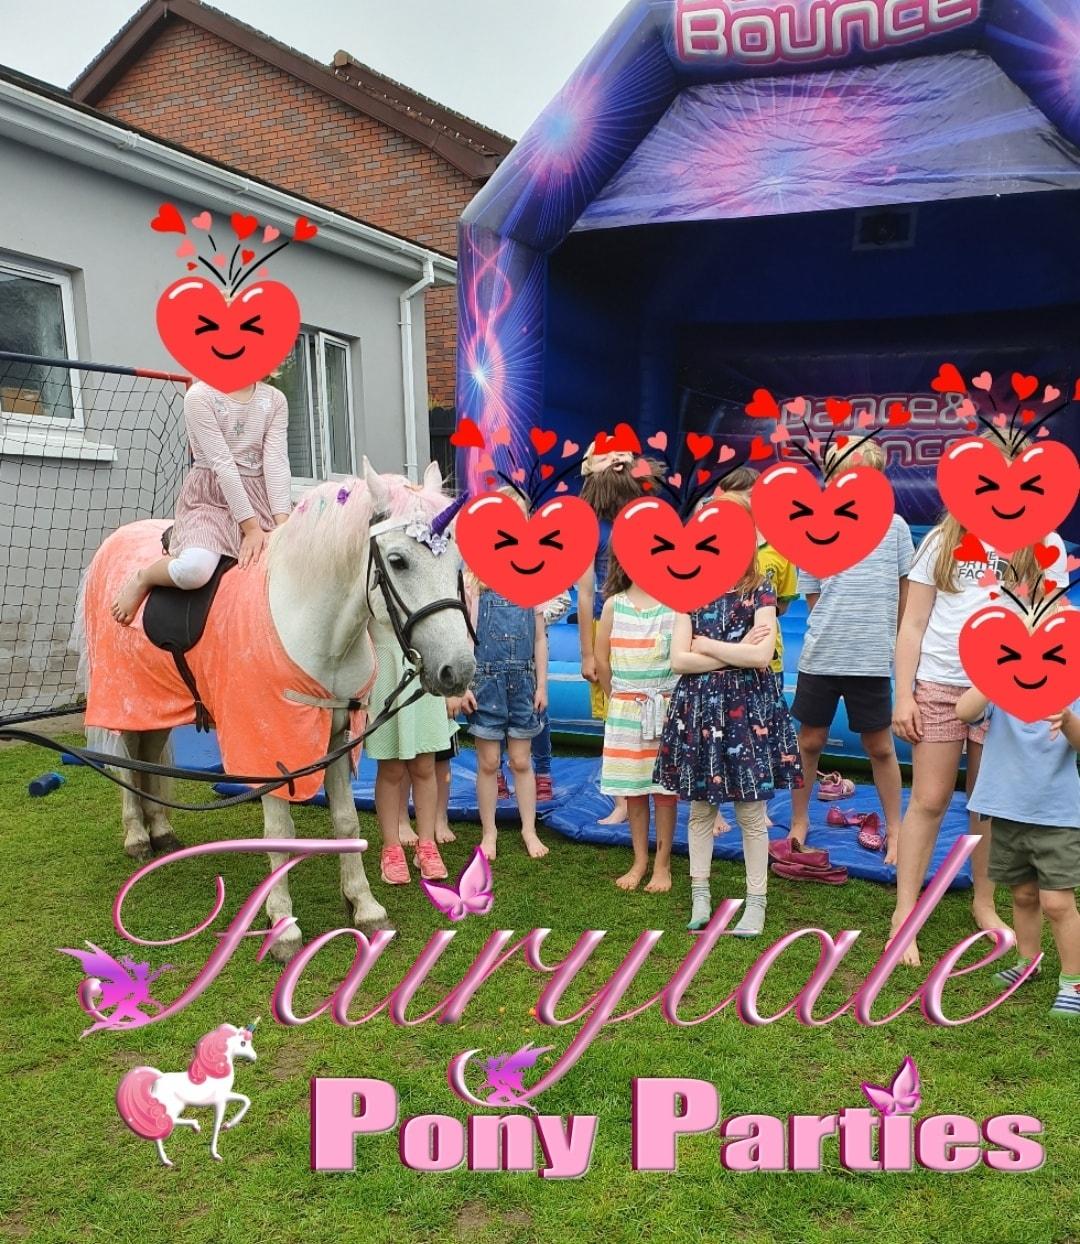 www.fairytaleponyparties.org